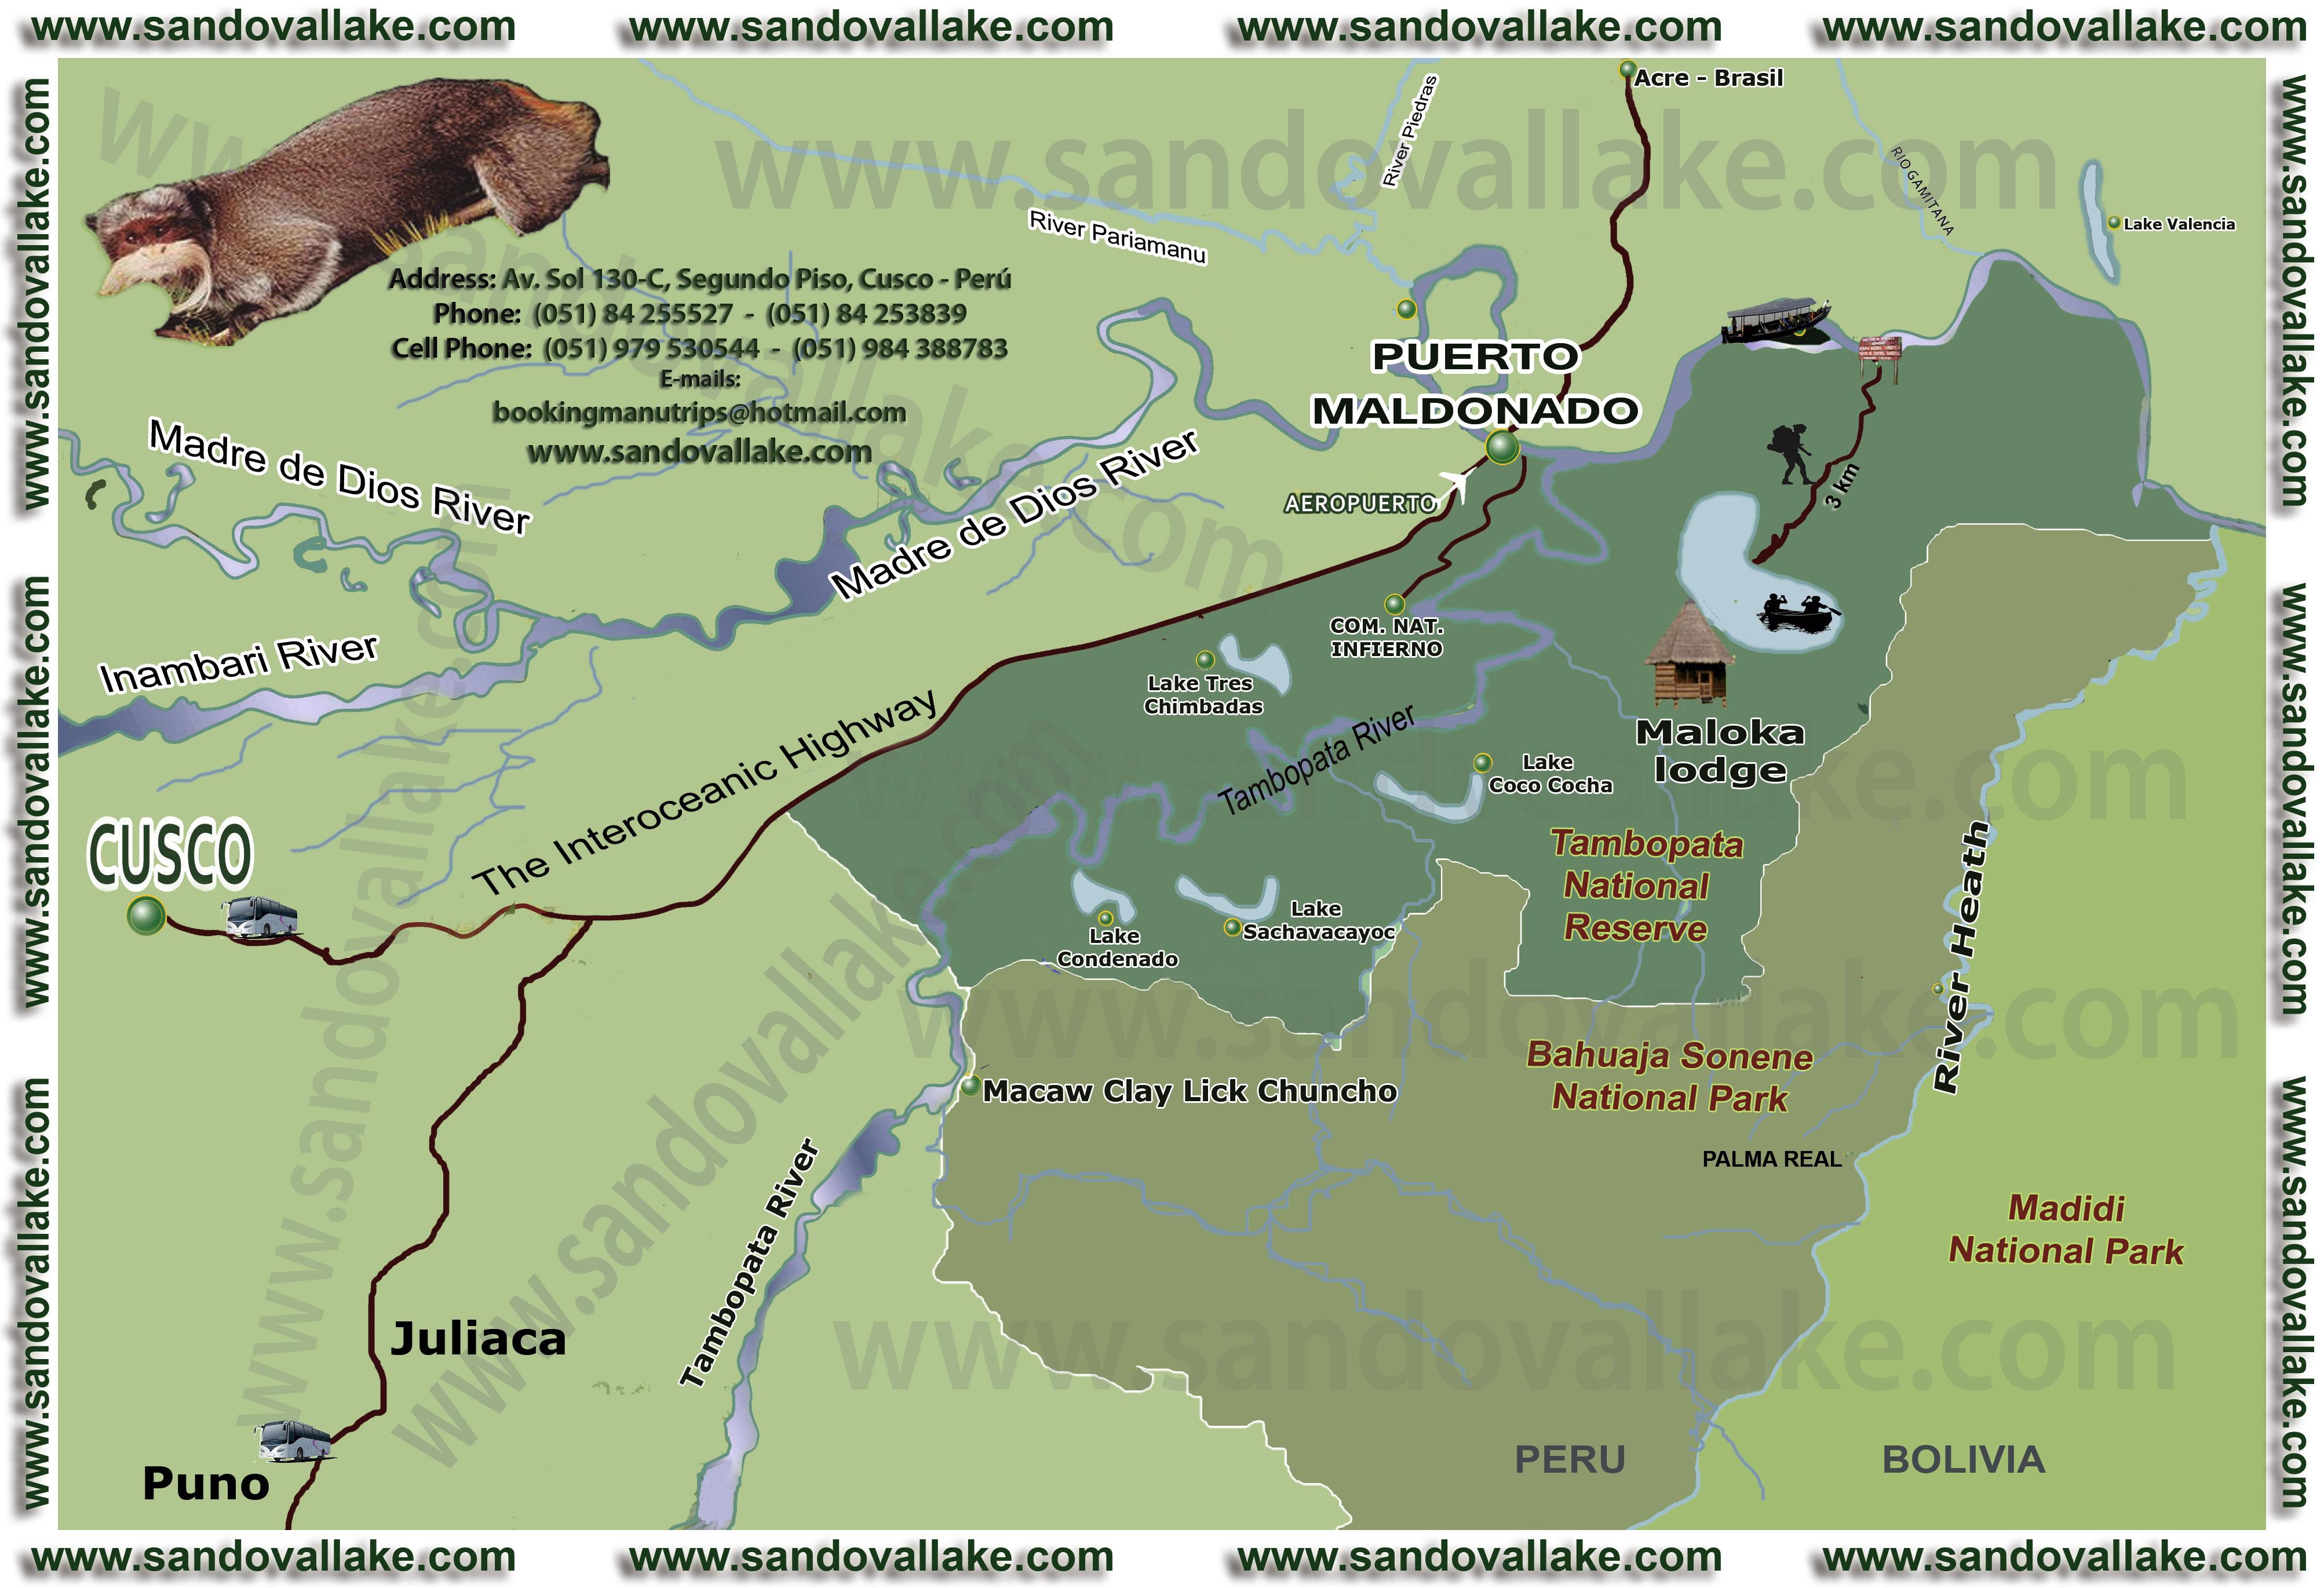 sandoval lake maloka lodge reserve tambopata